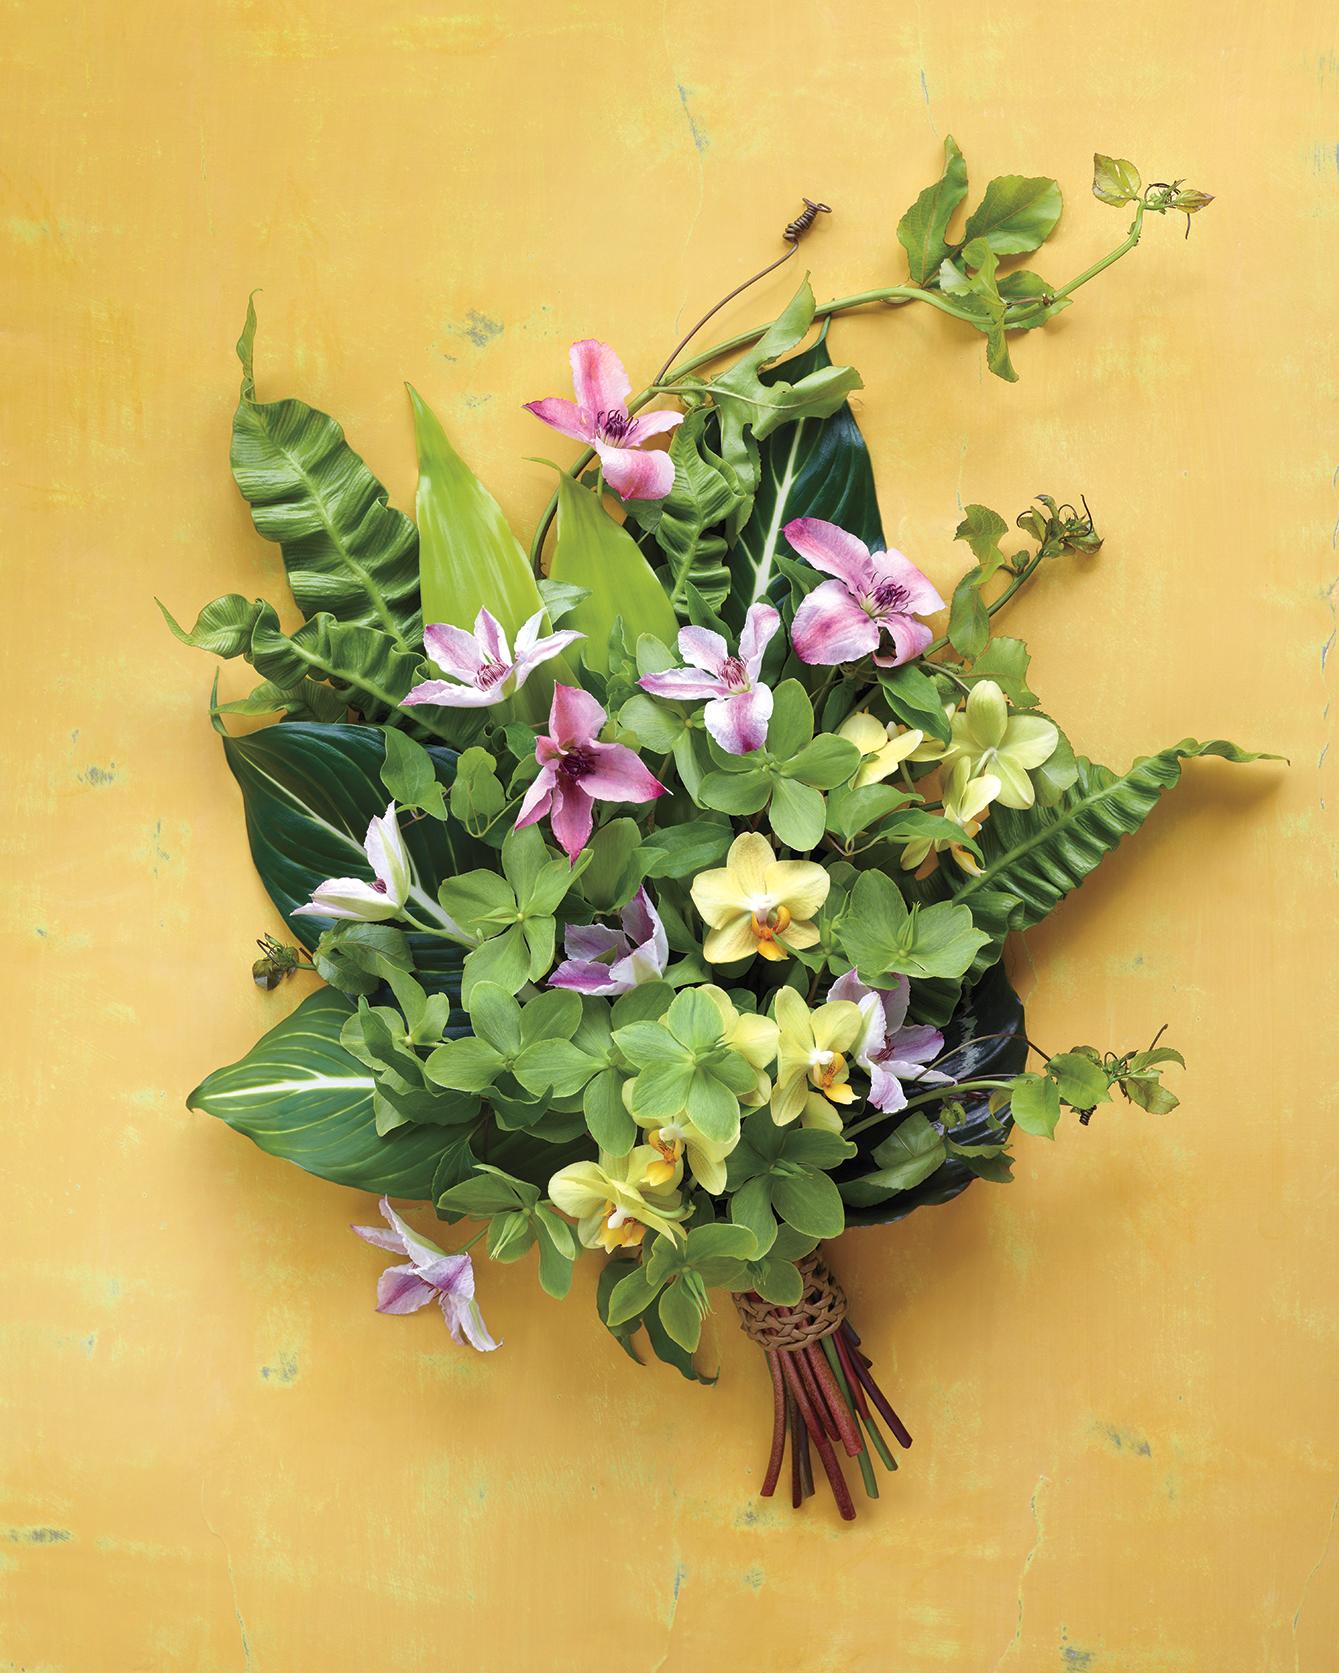 fabric-flowers-tropicalb2-md108763.jpg